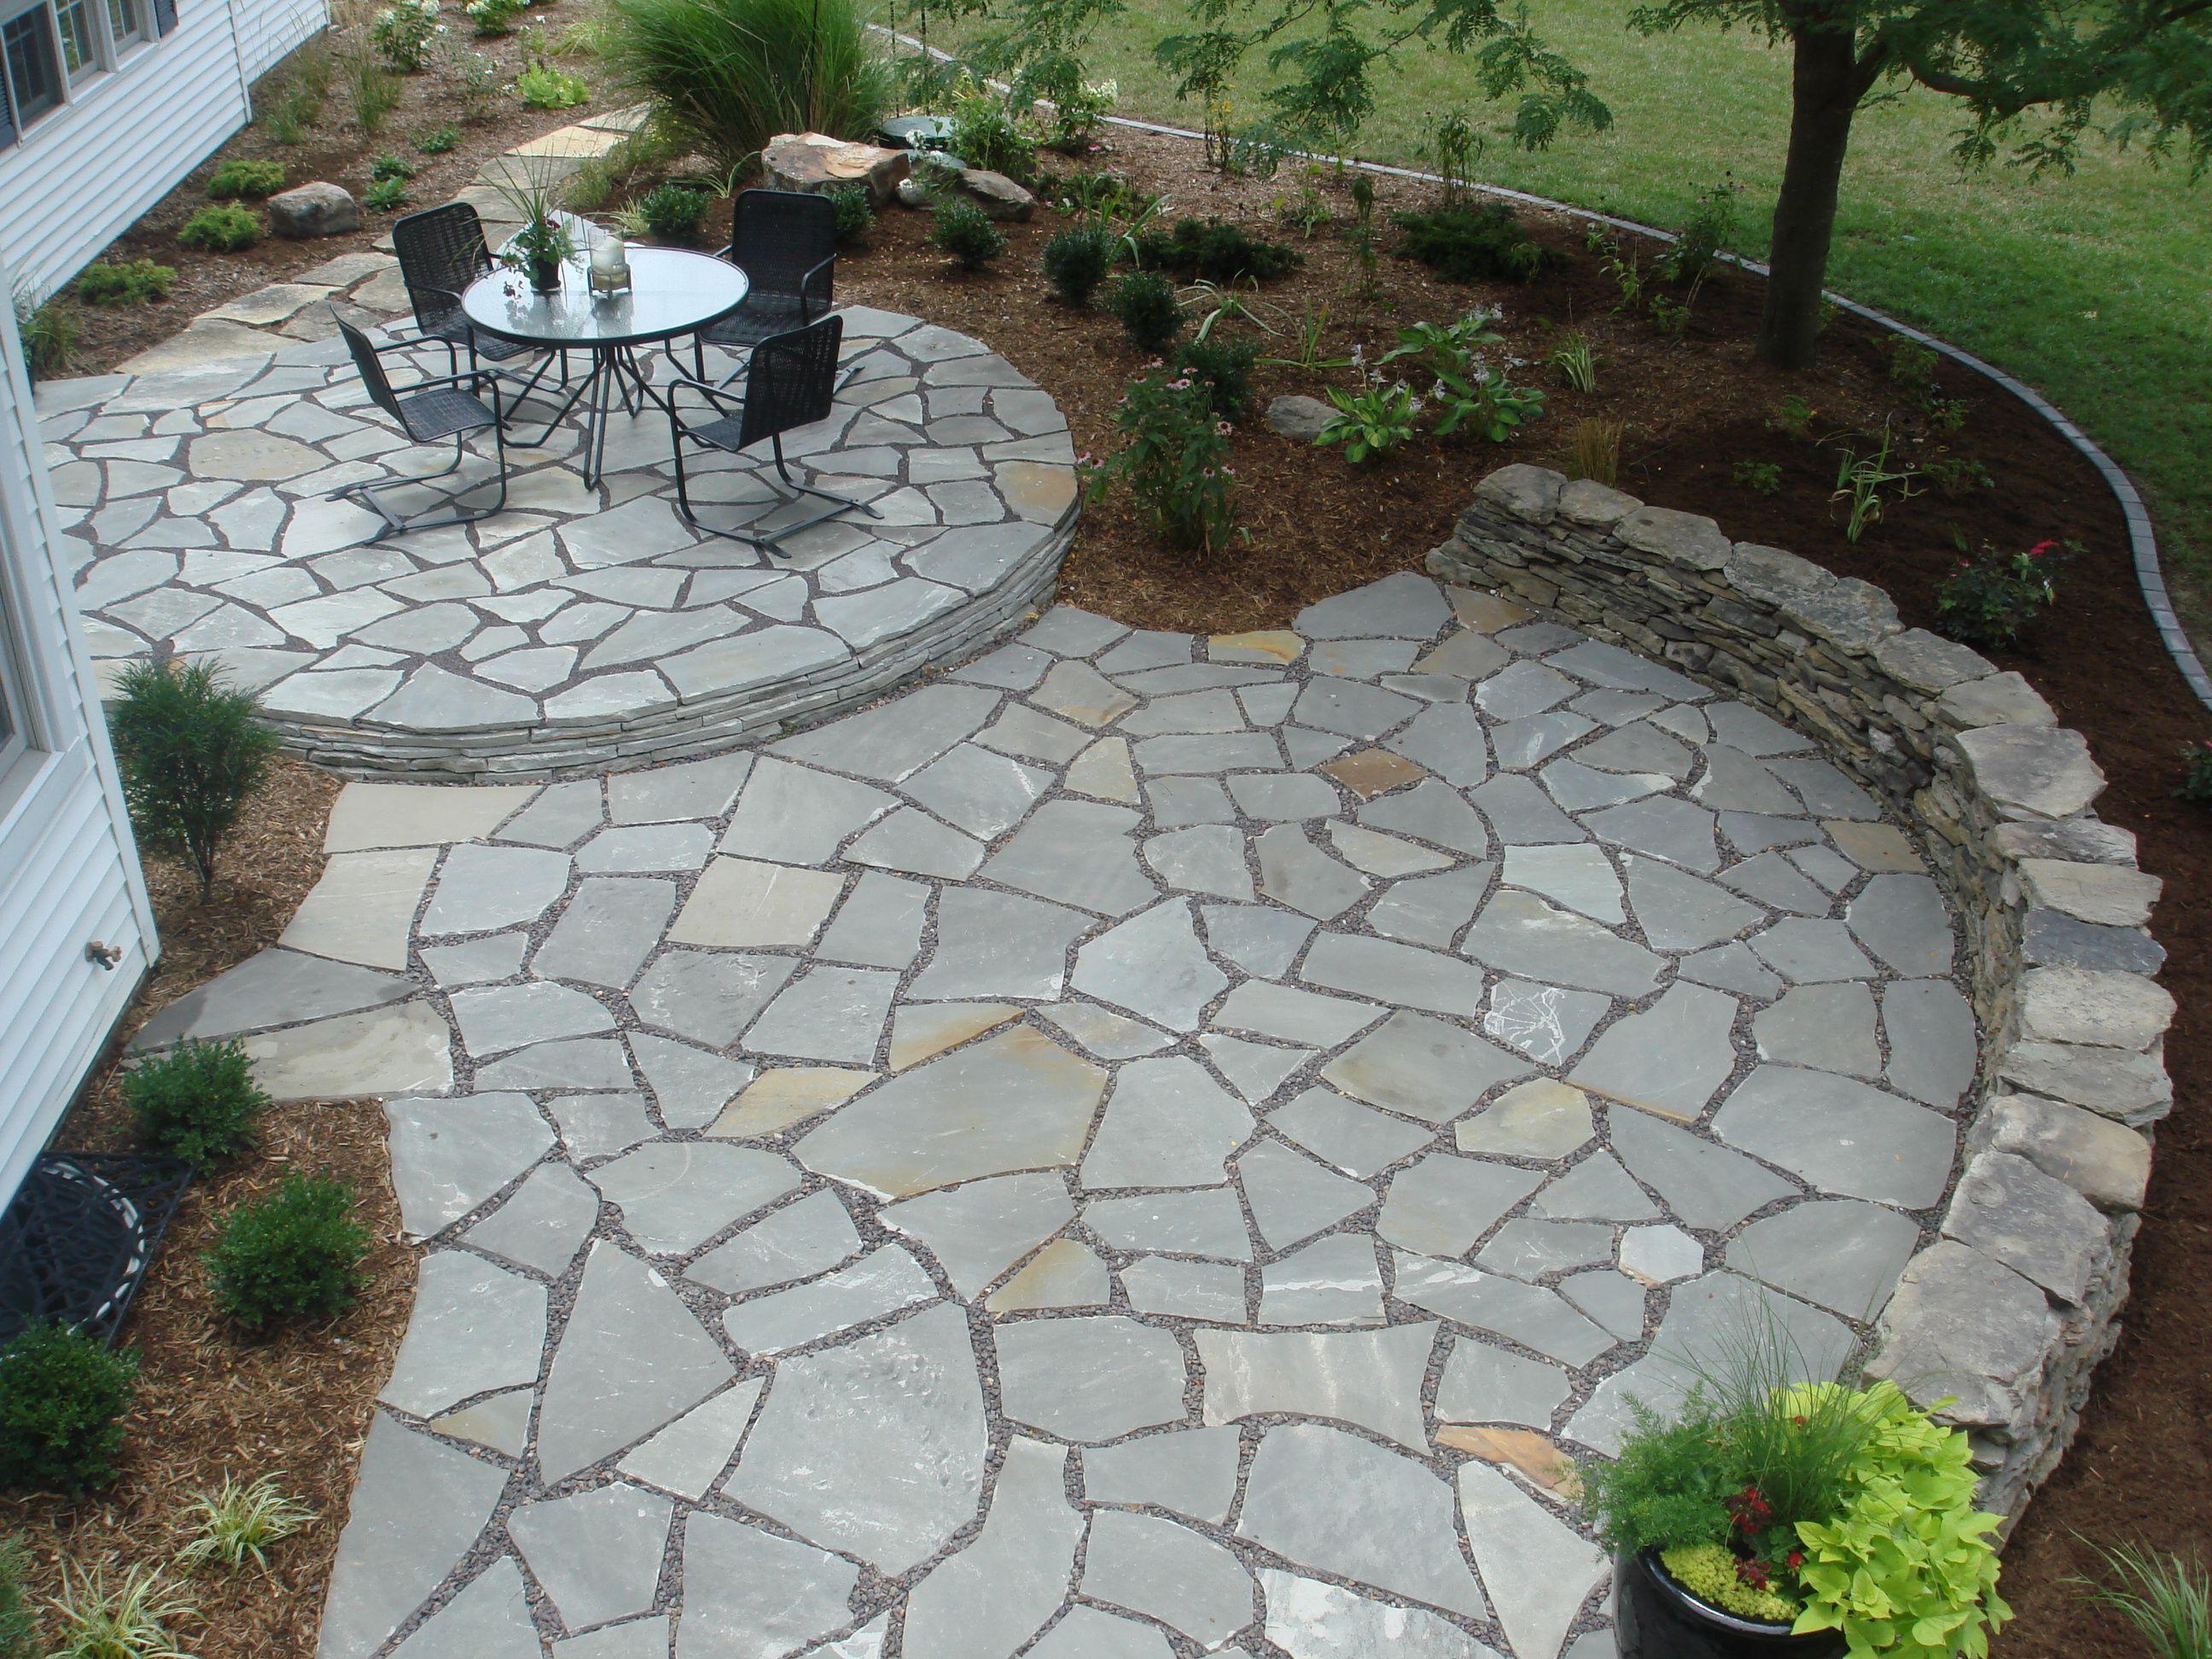 Dry Laid Flagstone Patio - Stone Patio Cost - Diy